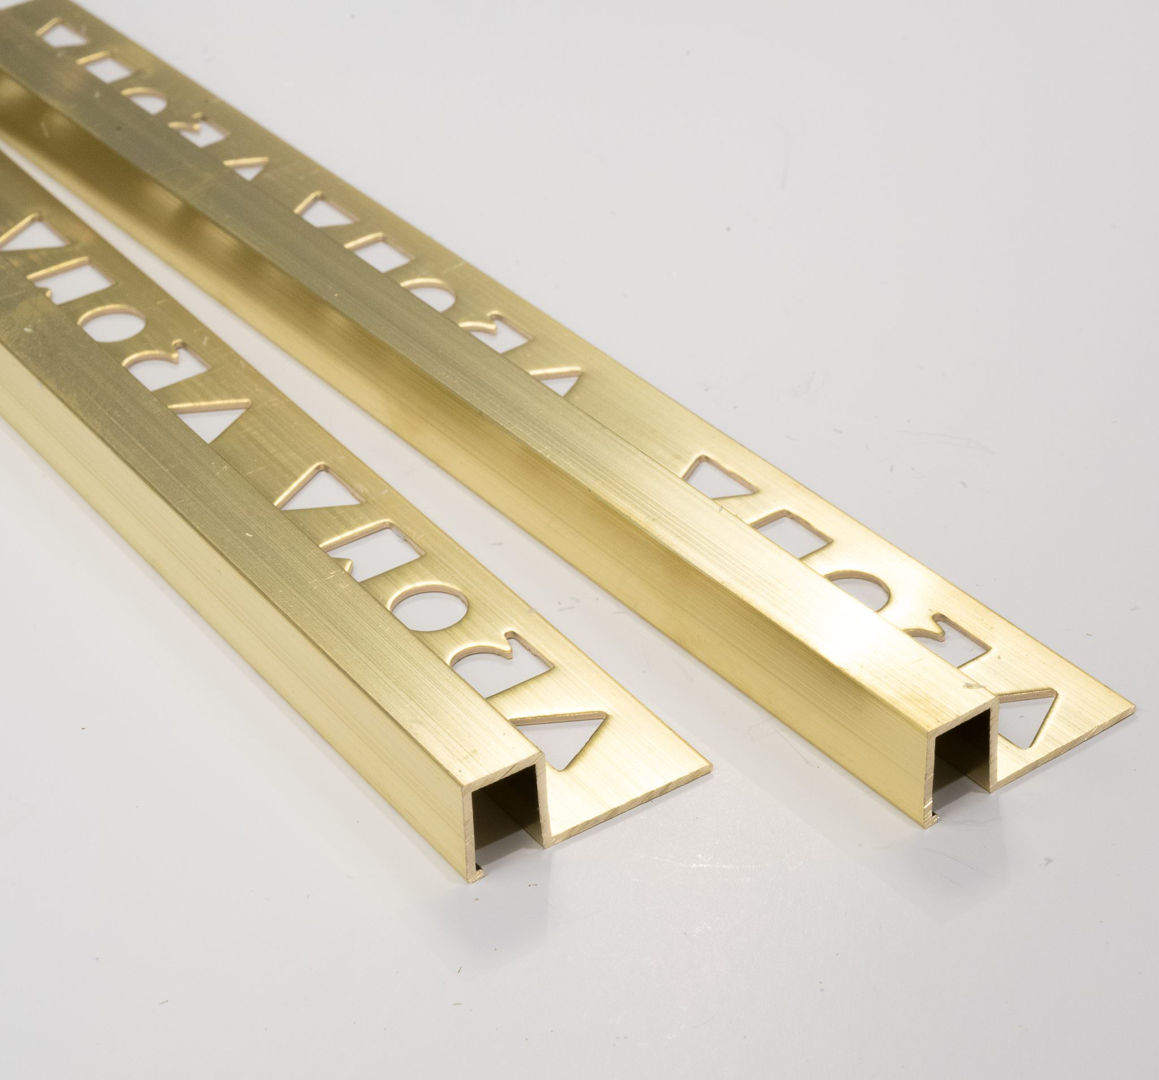 vroma brass natural finish box shape 2 5m heavy duty brass tile trims